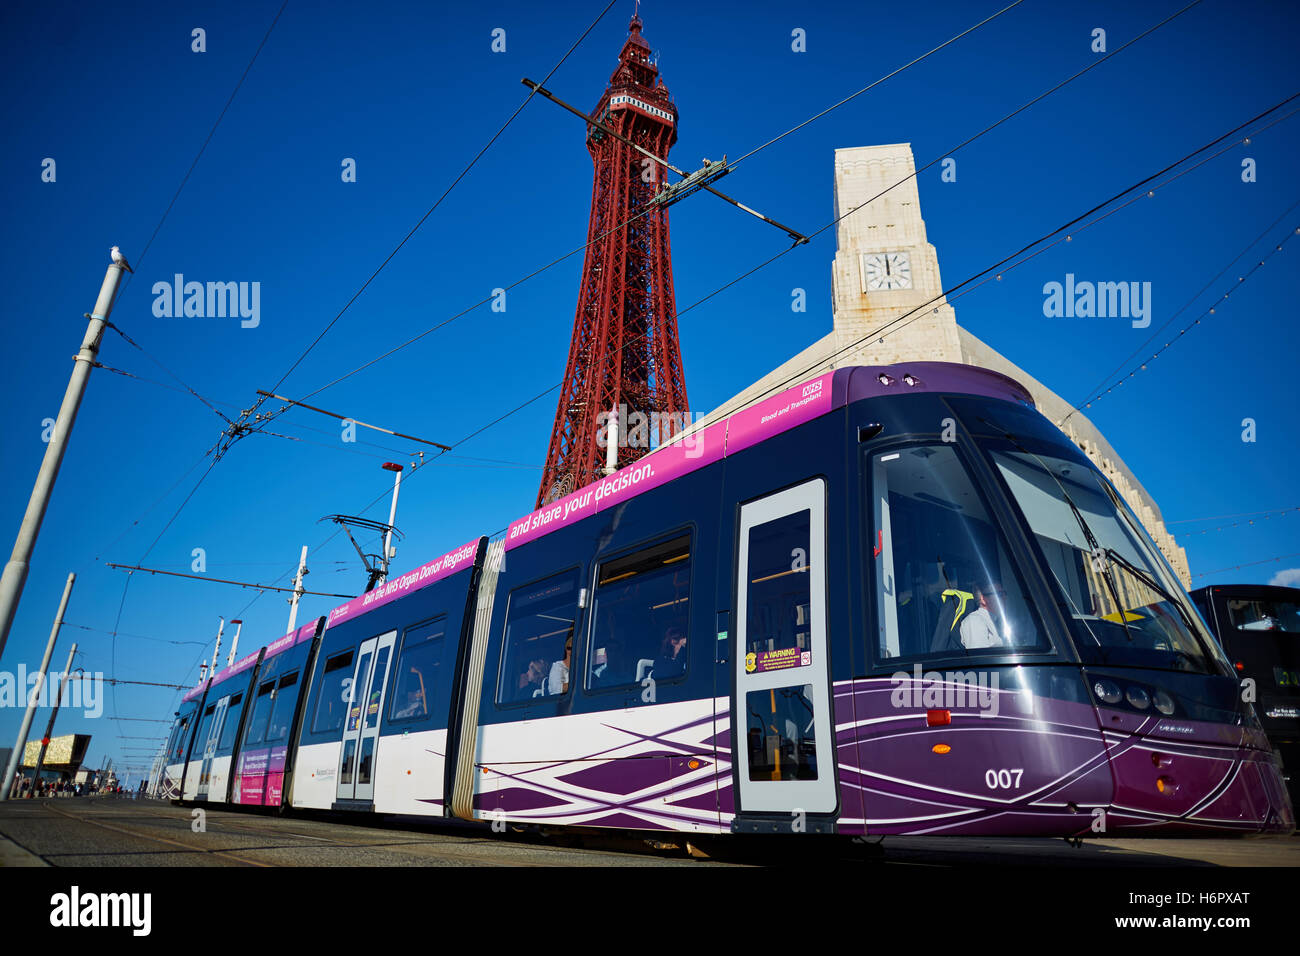 Blackpool ftower moderno tram light rail Holiday sea side town resort Lancashire attrazioni turistiche tower copyspace Immagini Stock